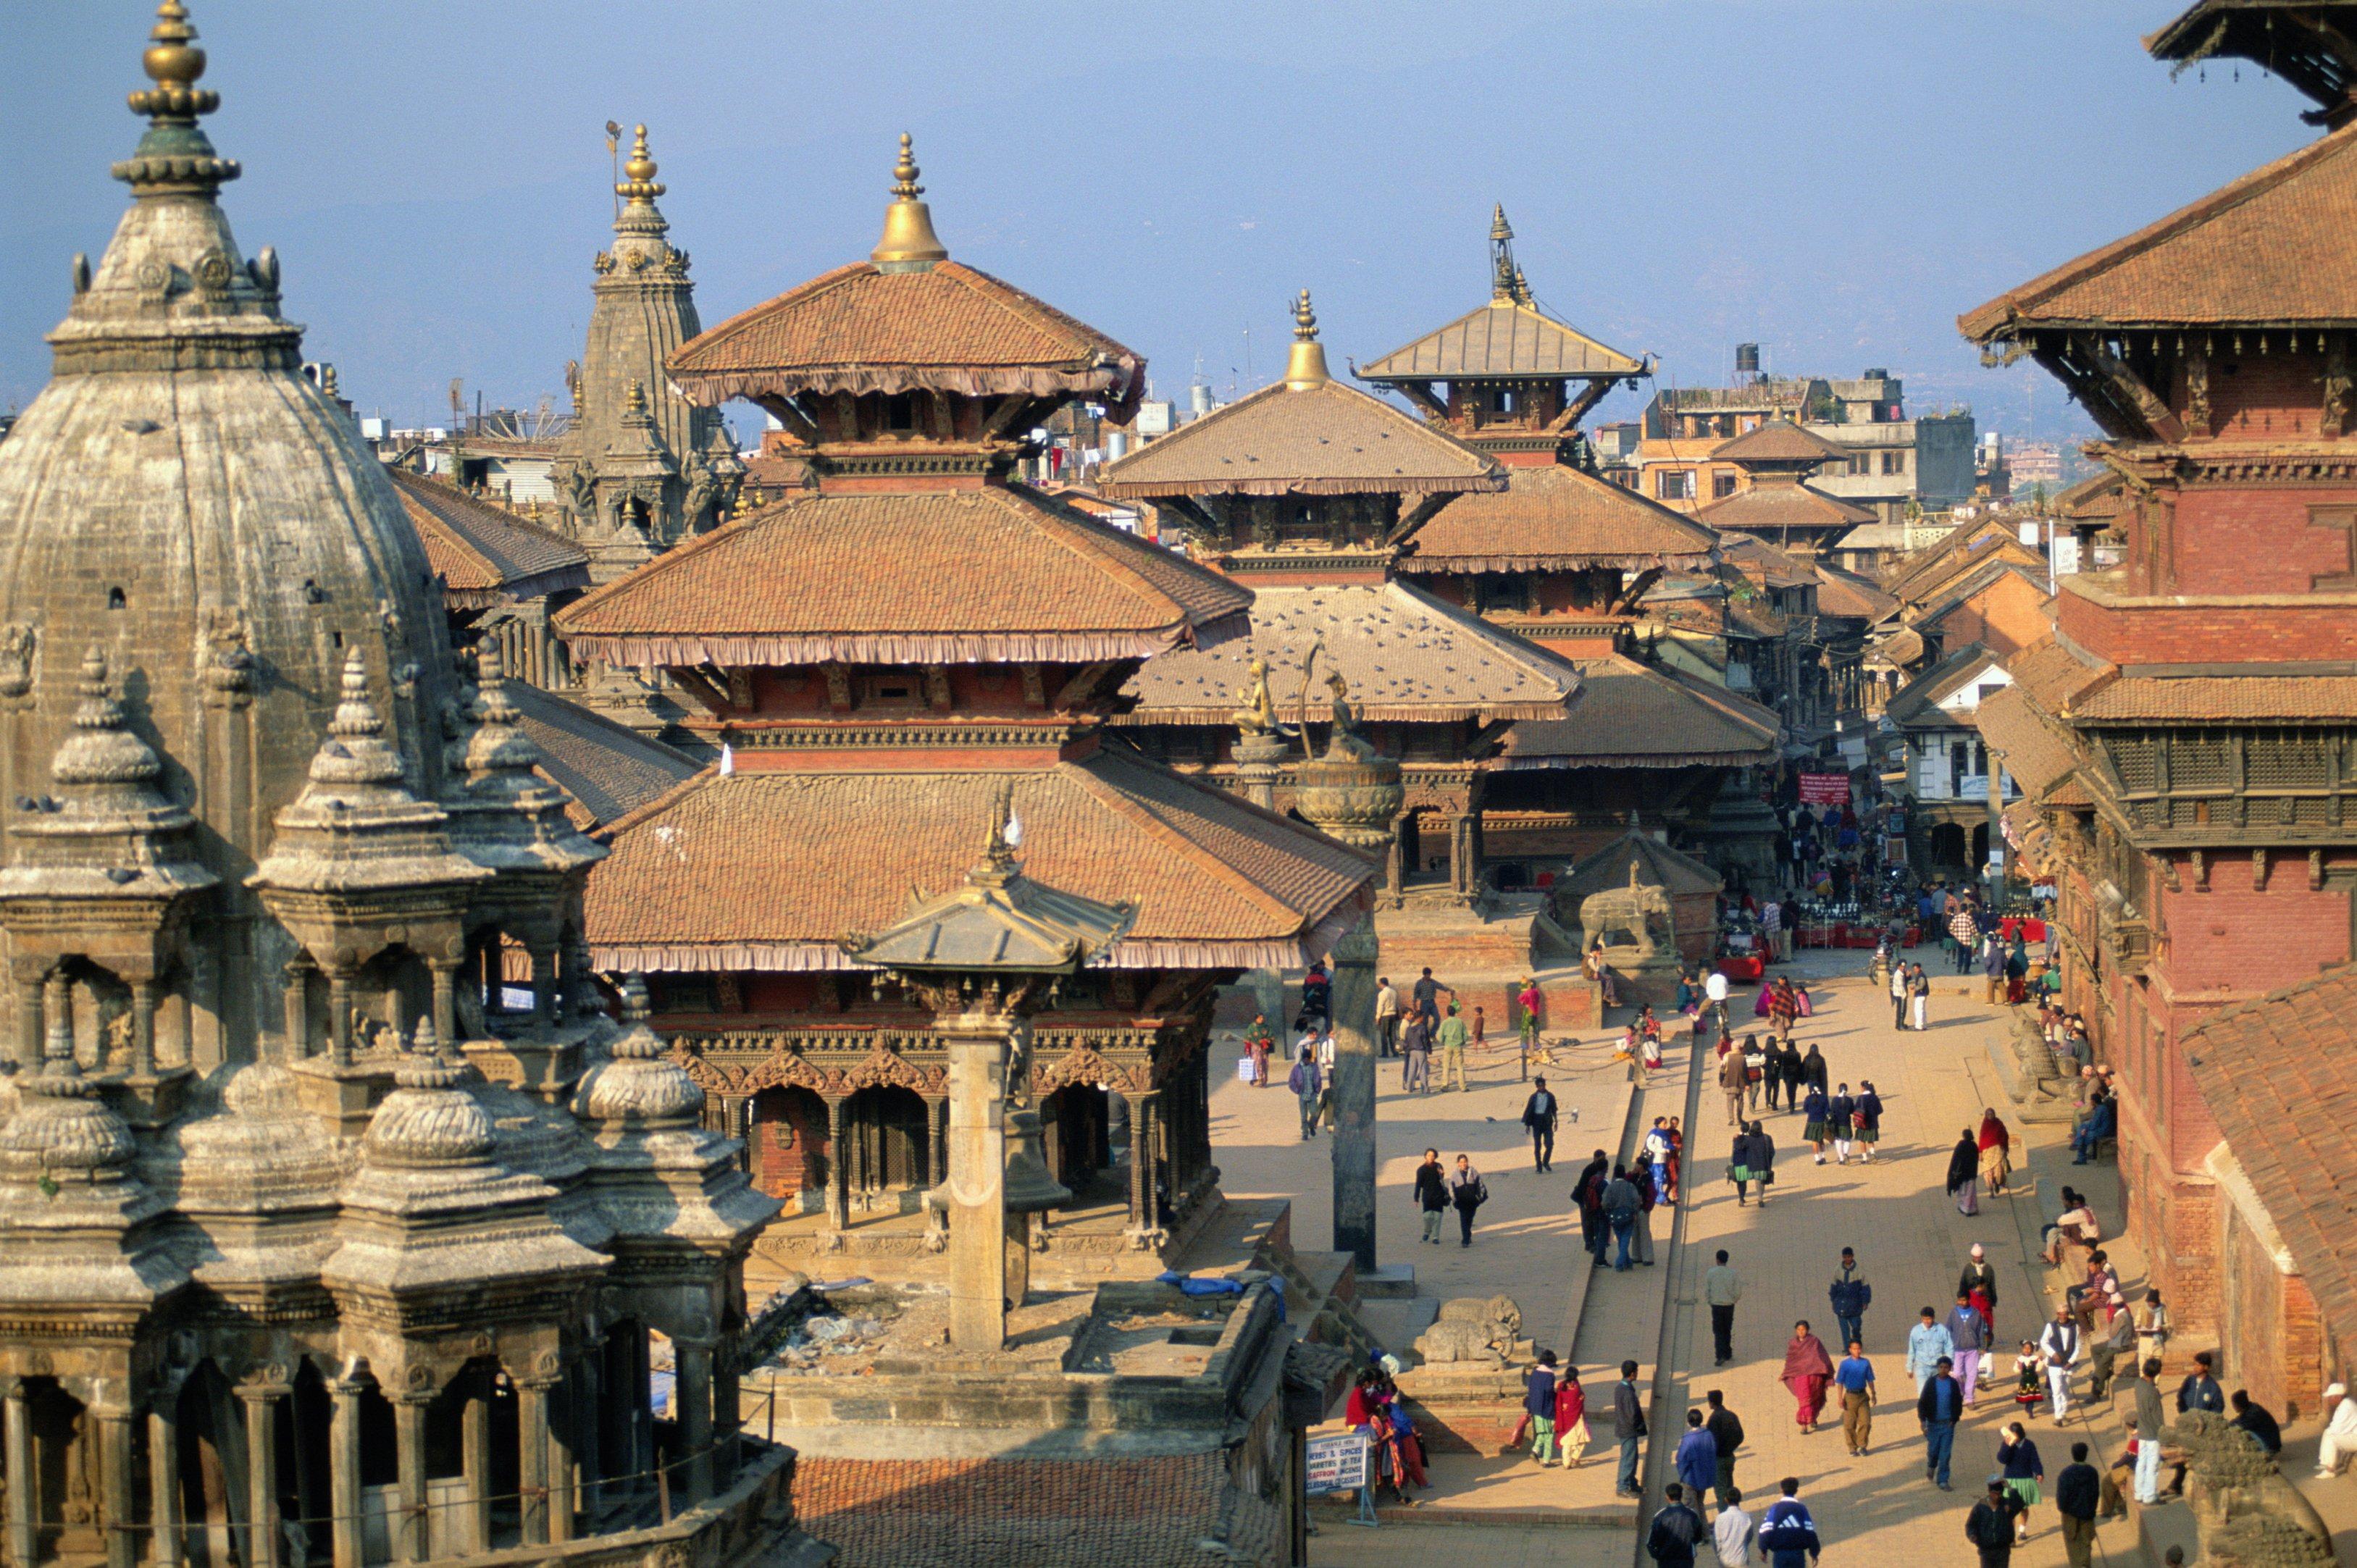 #DURBAR SQUARE #PATAN, NEPAL